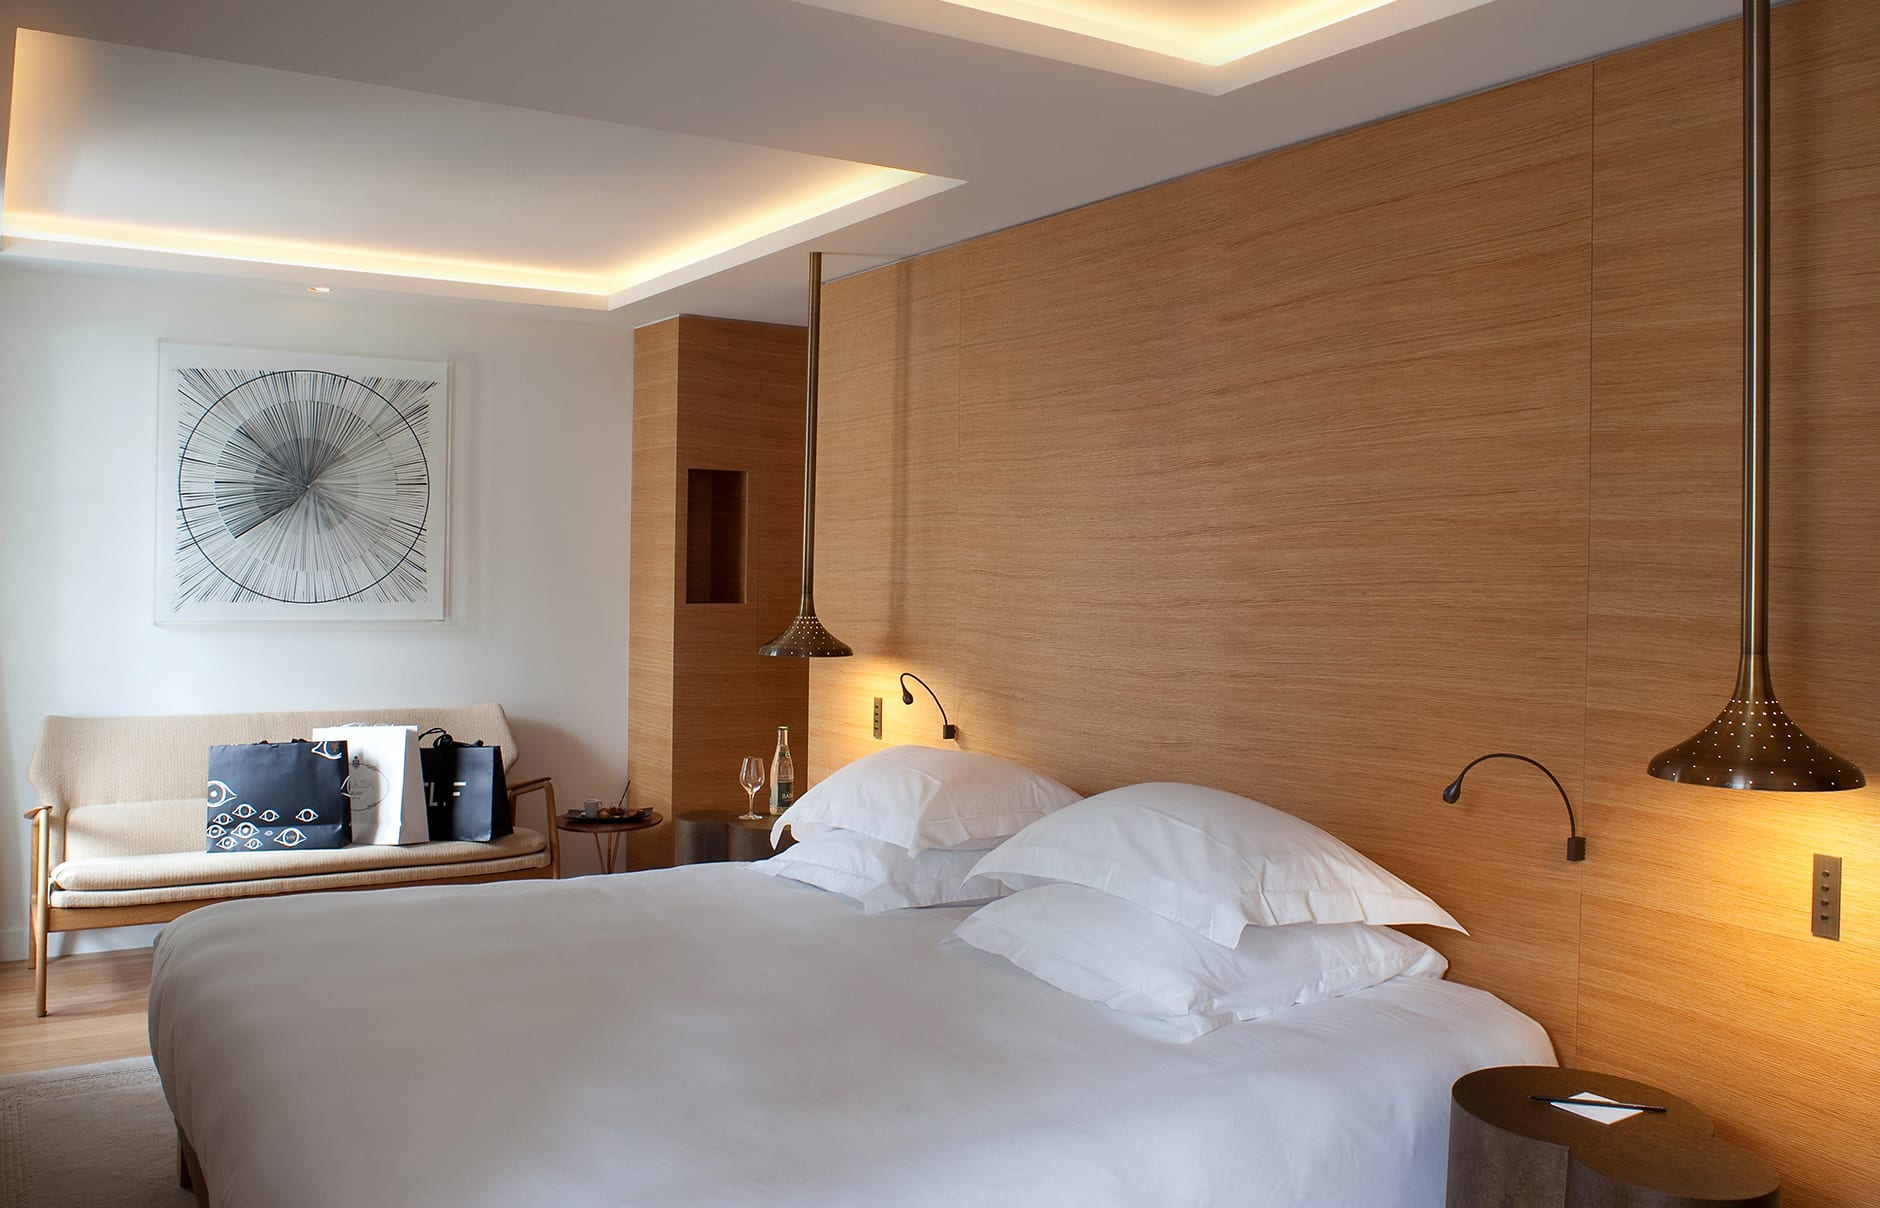 Prestige Room. Marignan Paris, France. © Marignan